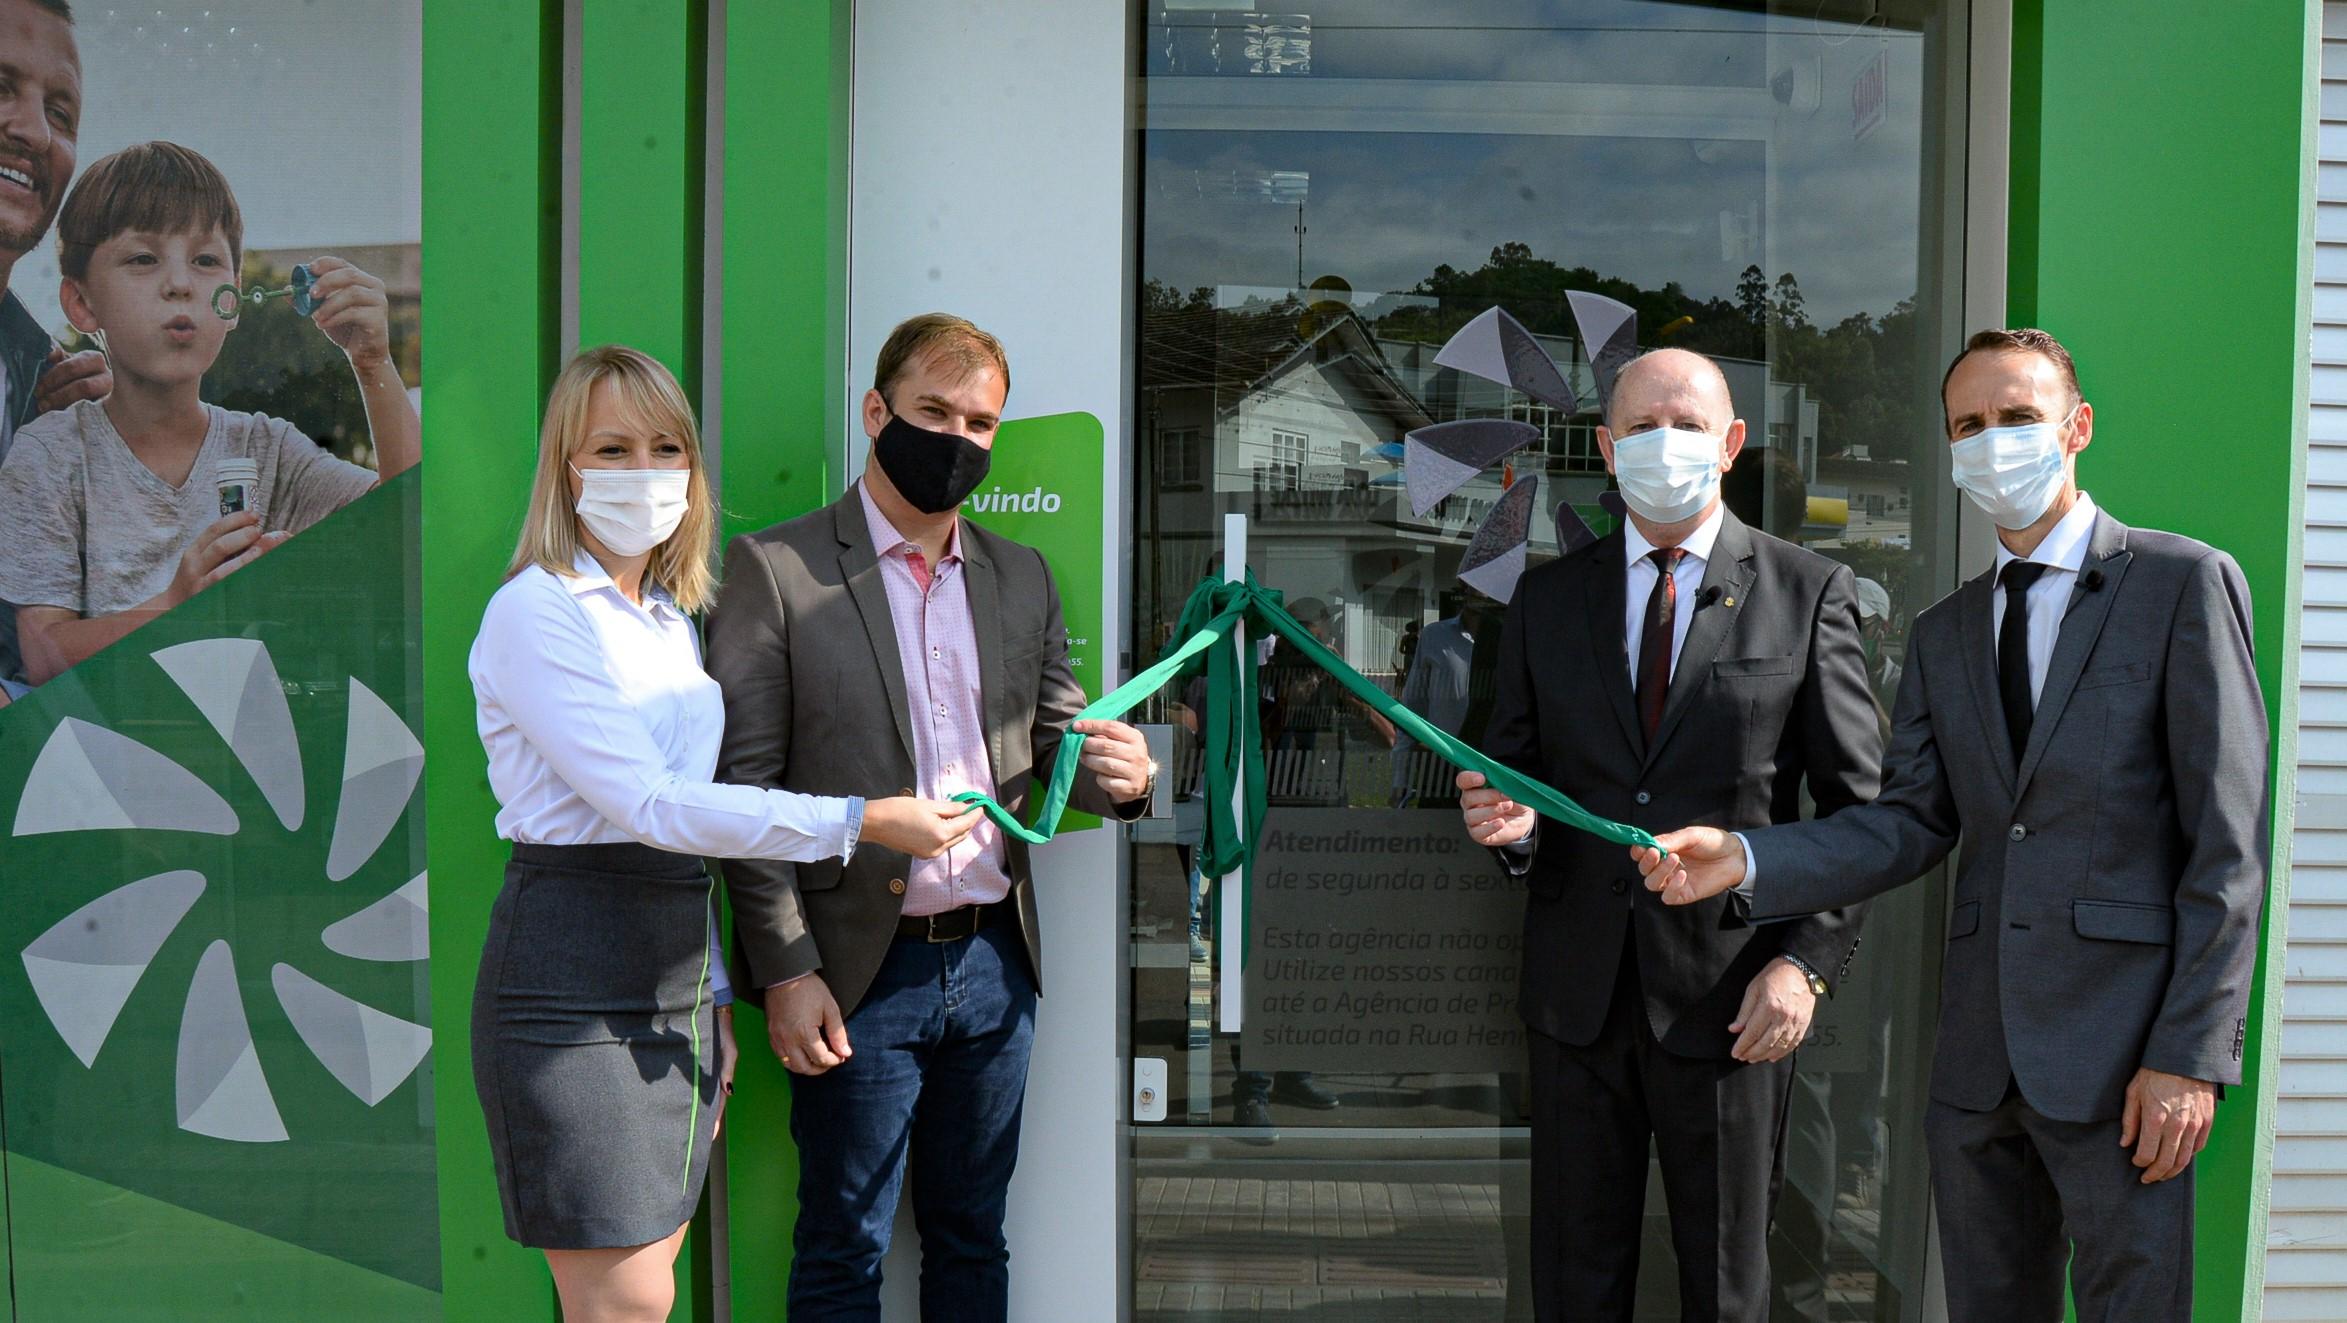 Sicredi Cooperação RS/SC inaugura agência em Ibirama/SC